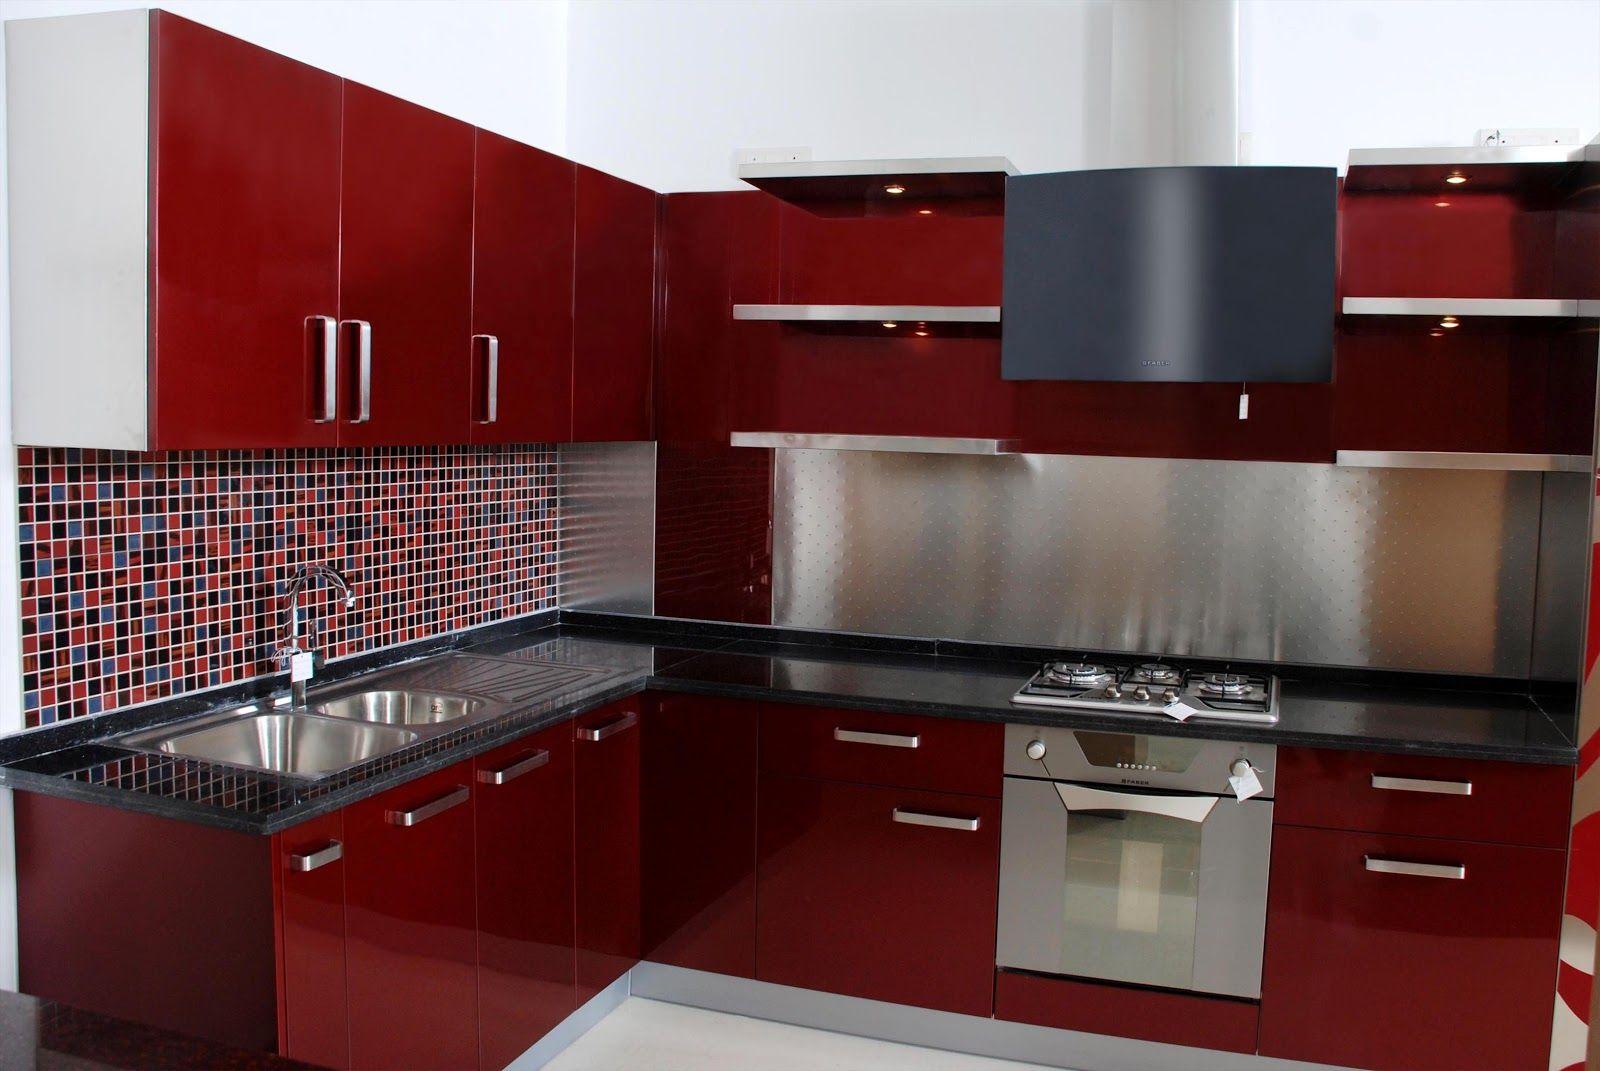 Parallel kitchen design india google search